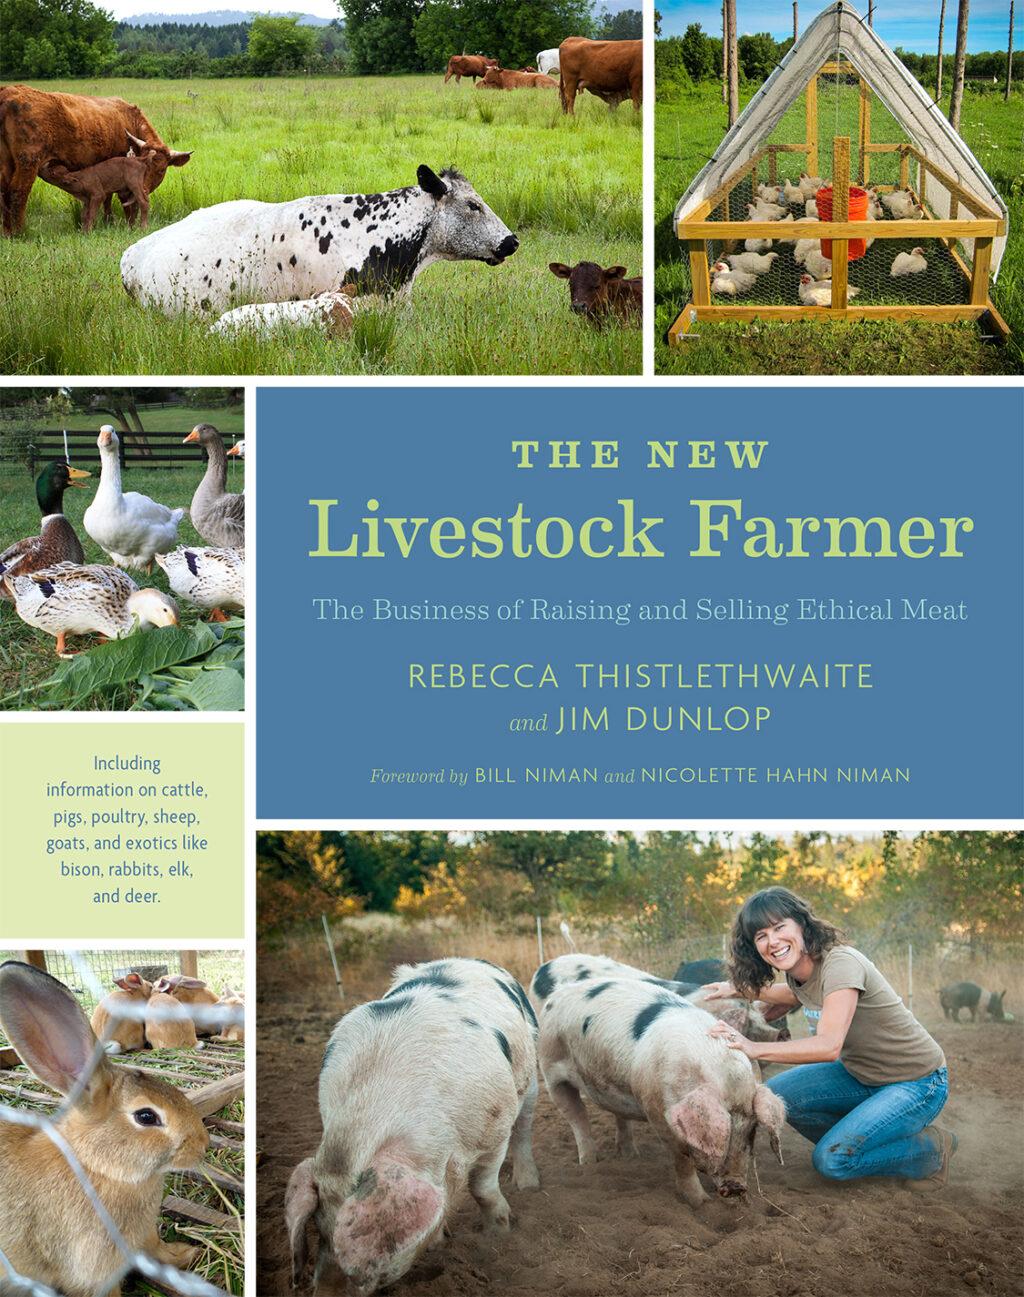 The New Livestock Farmer by Rebecca Thistlethwaite at Chelsea Green  Publishing